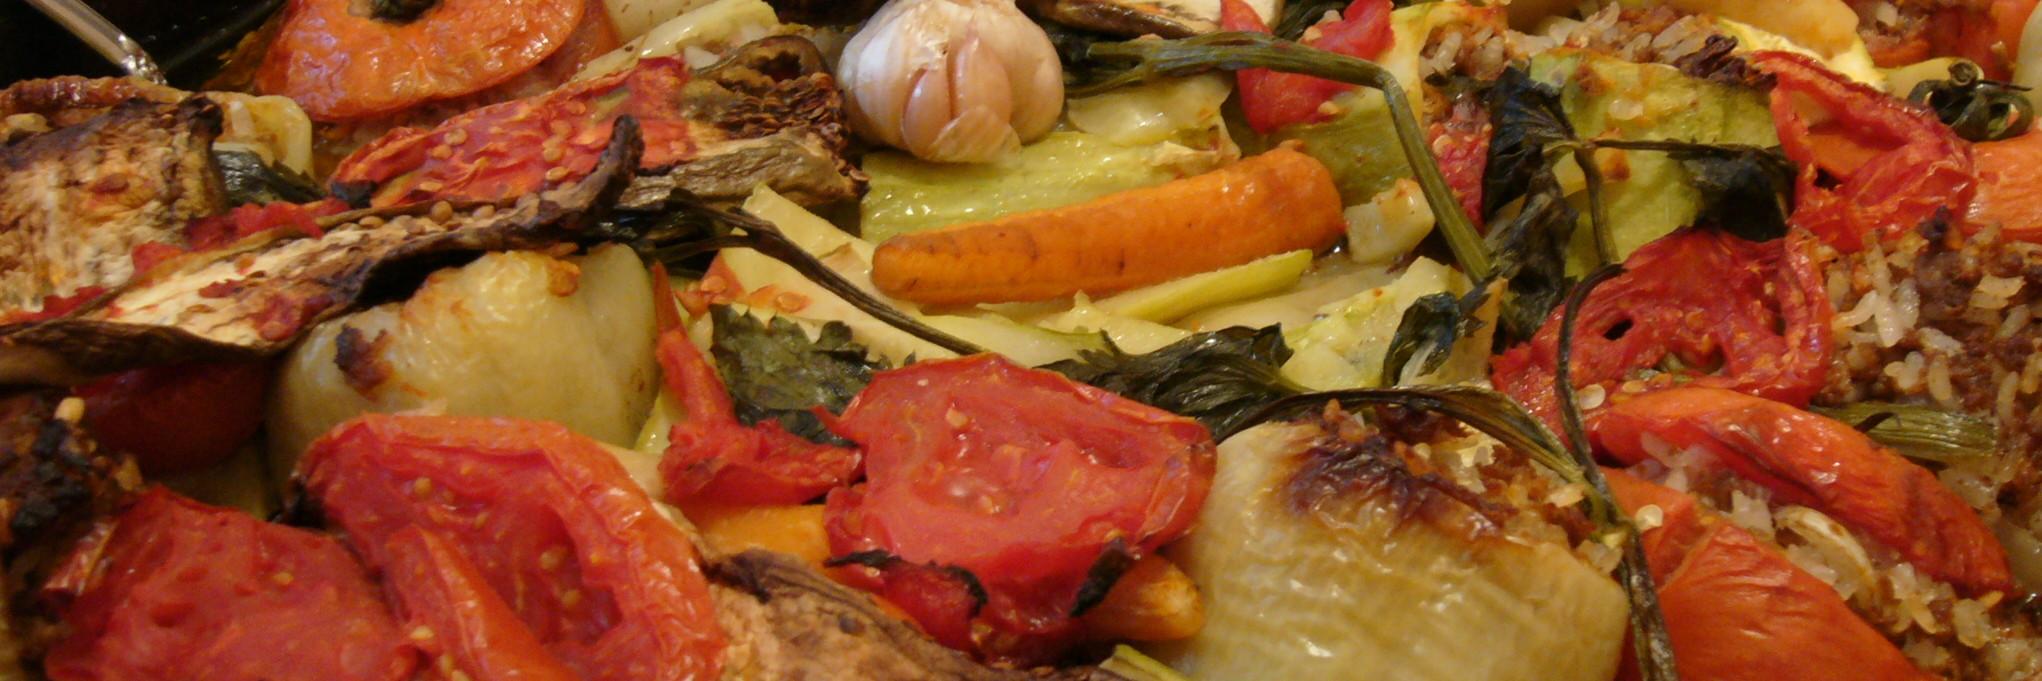 Антун Ханги о кулинарных традициях. BiHVolim, CC BY-SA 4.0